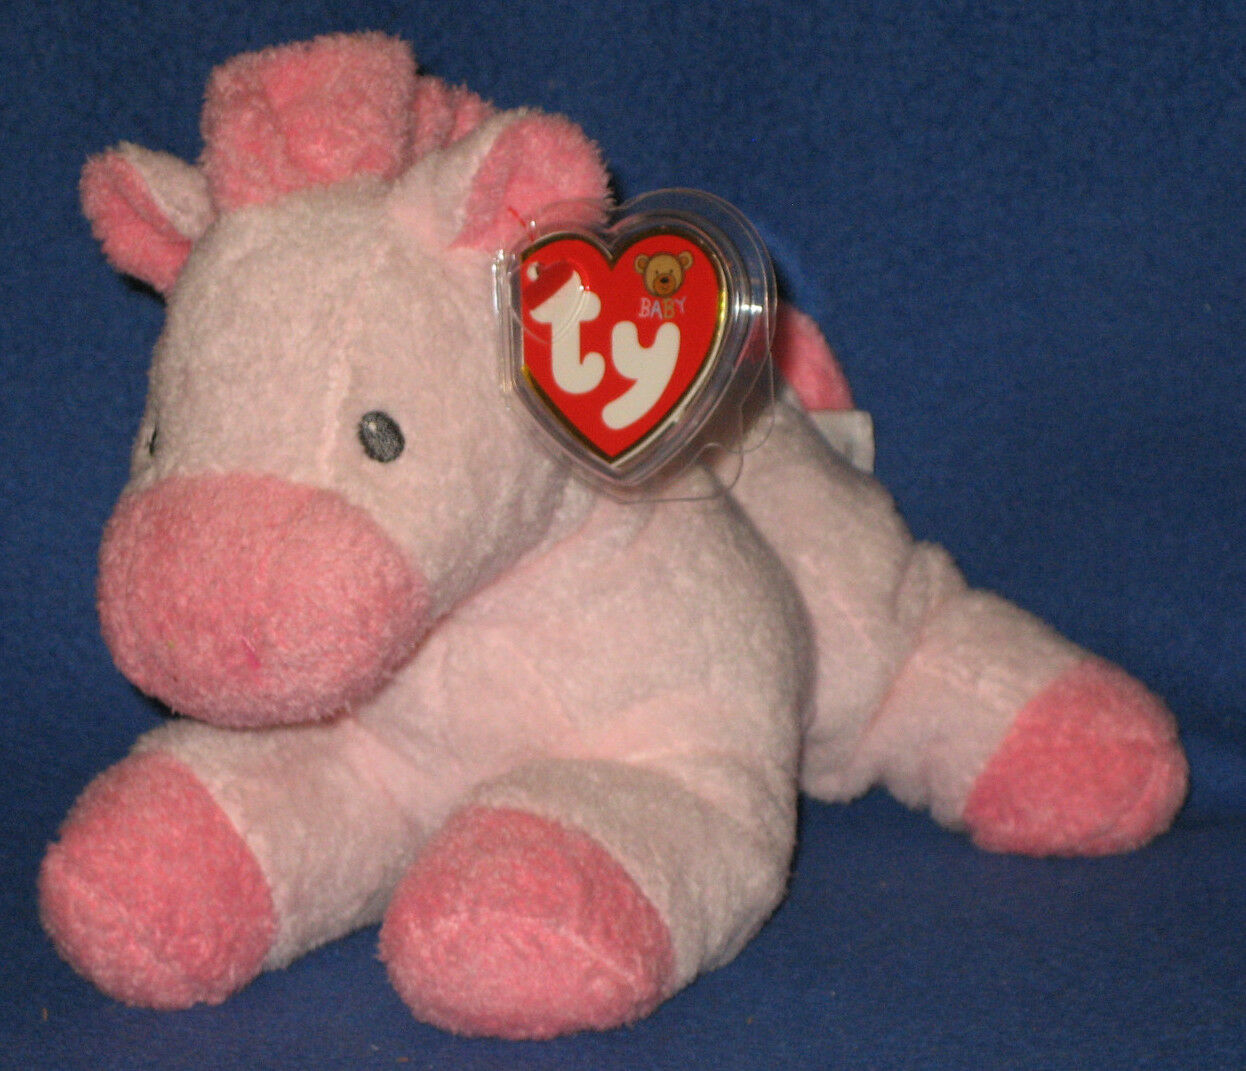 Mein pferdchen Rosa pferd - baby - ty - minze mit mint - tags